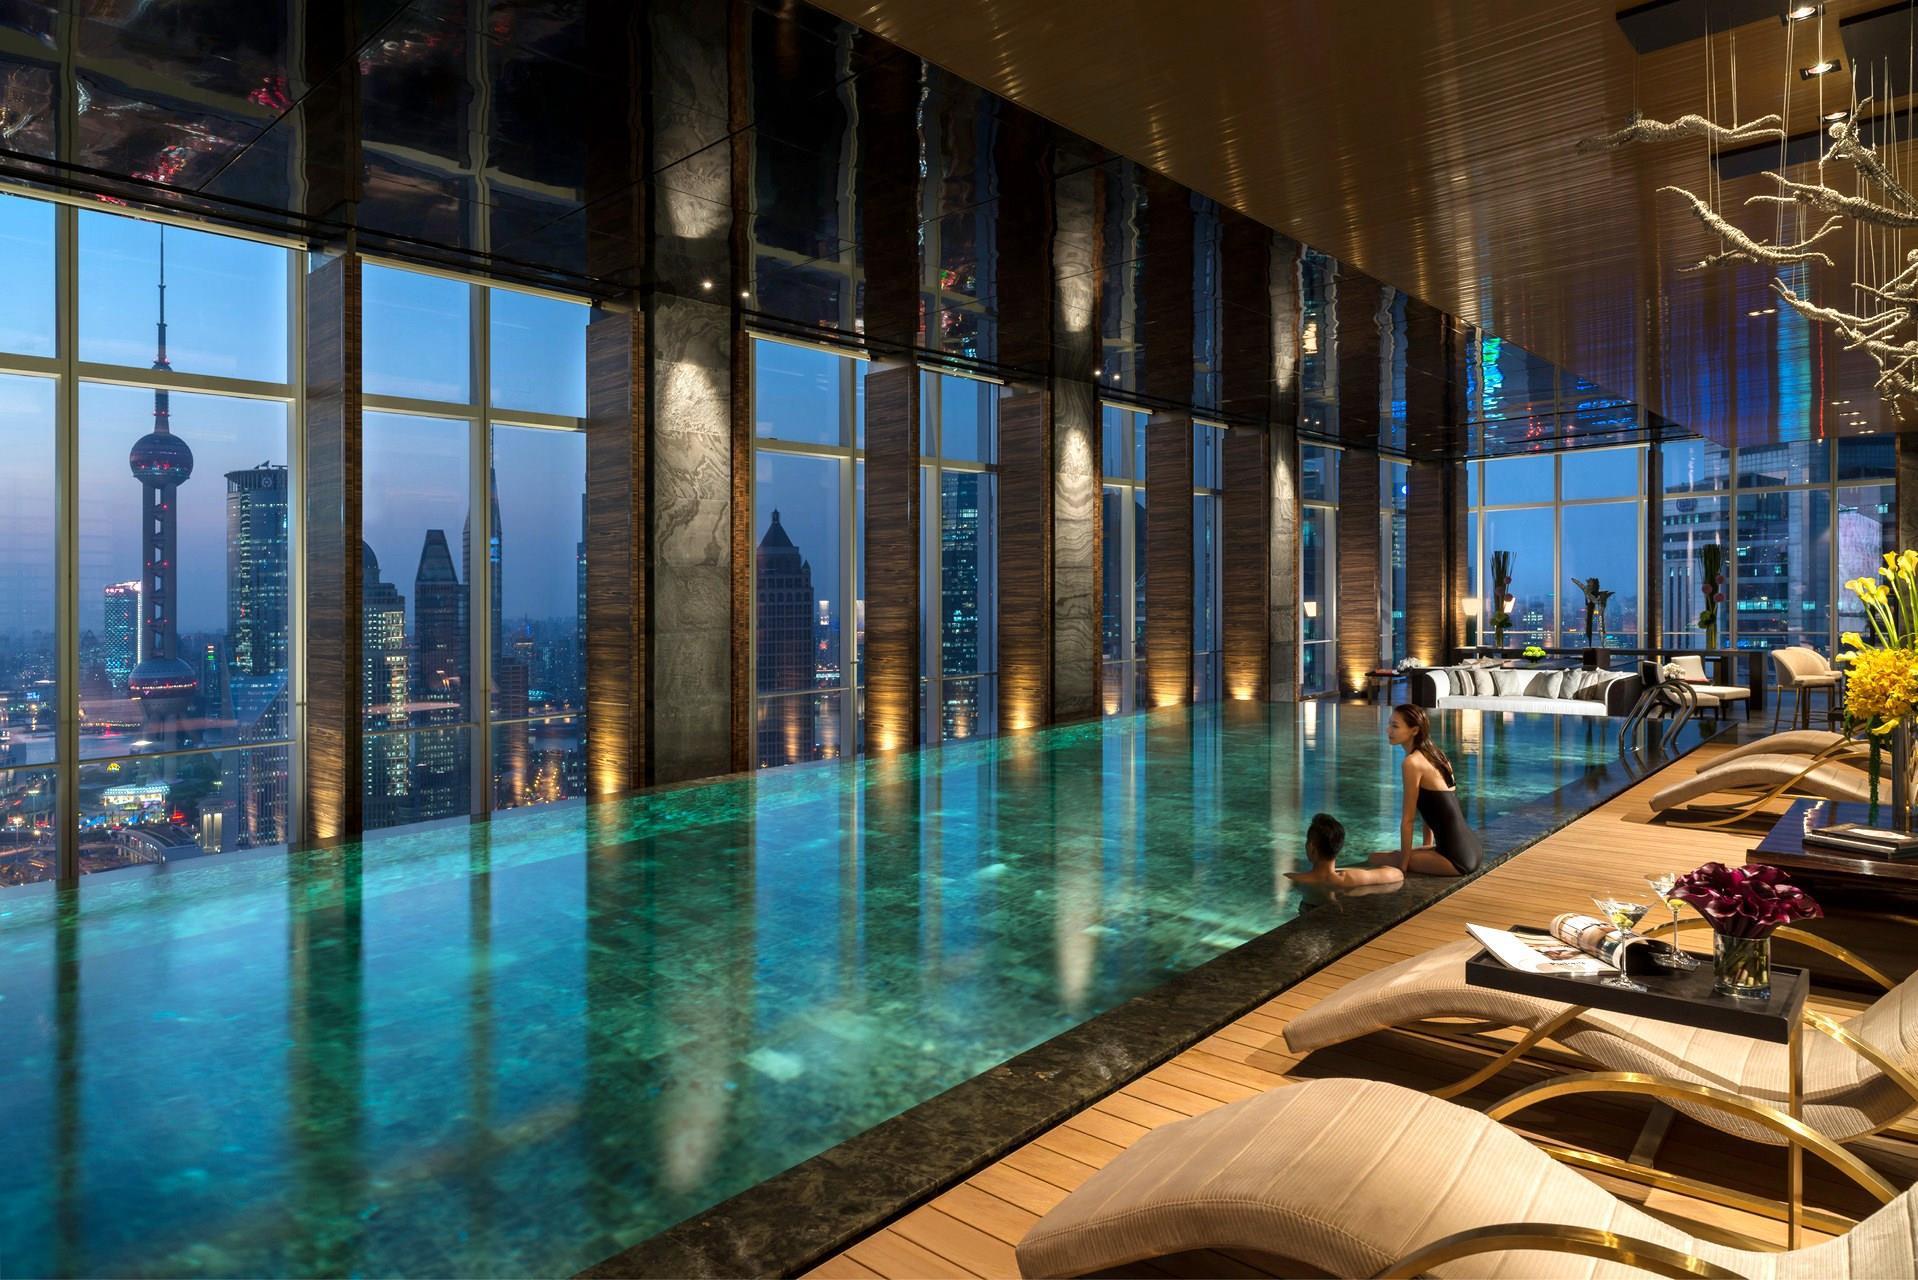 интерьер Шанхай Китай отель interior Shanghai China the hotel без смс